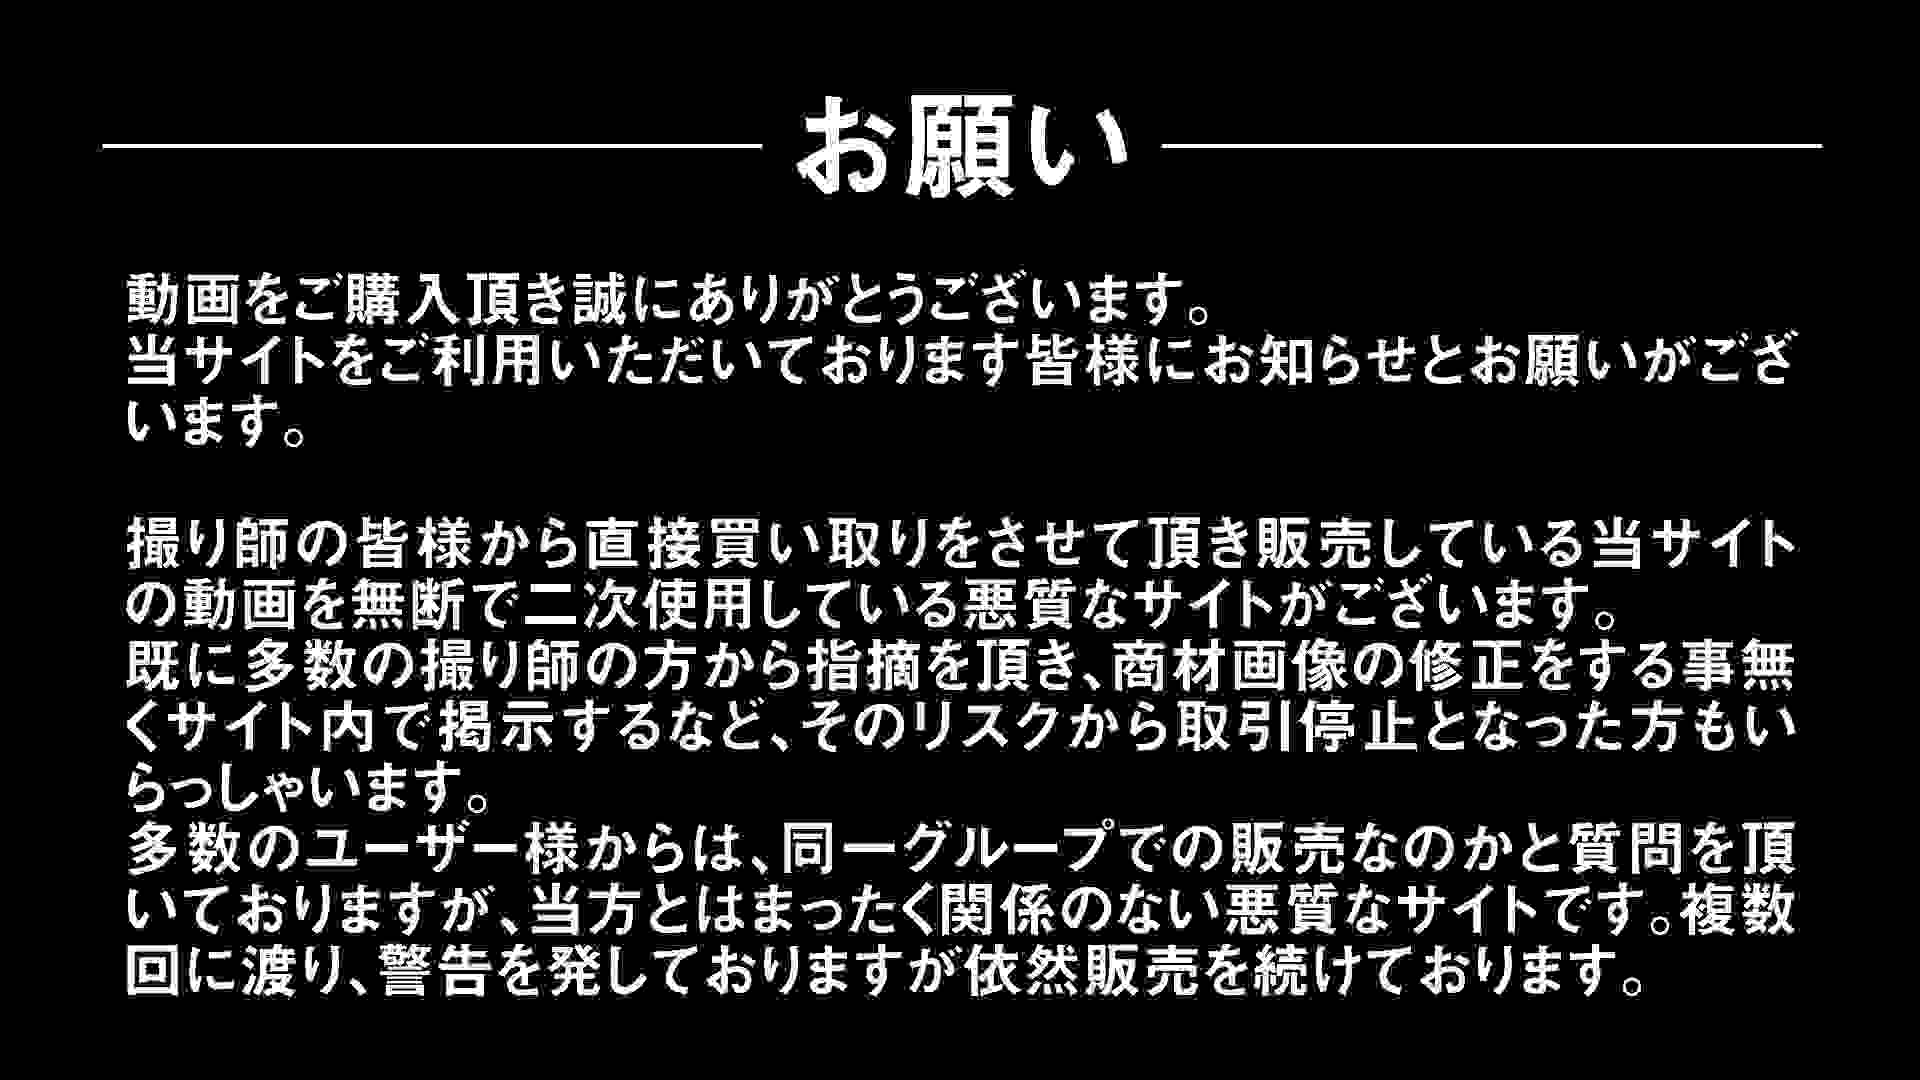 Aquaな露天風呂Vol.298 女体盗撮 | OL女体  60連発 1